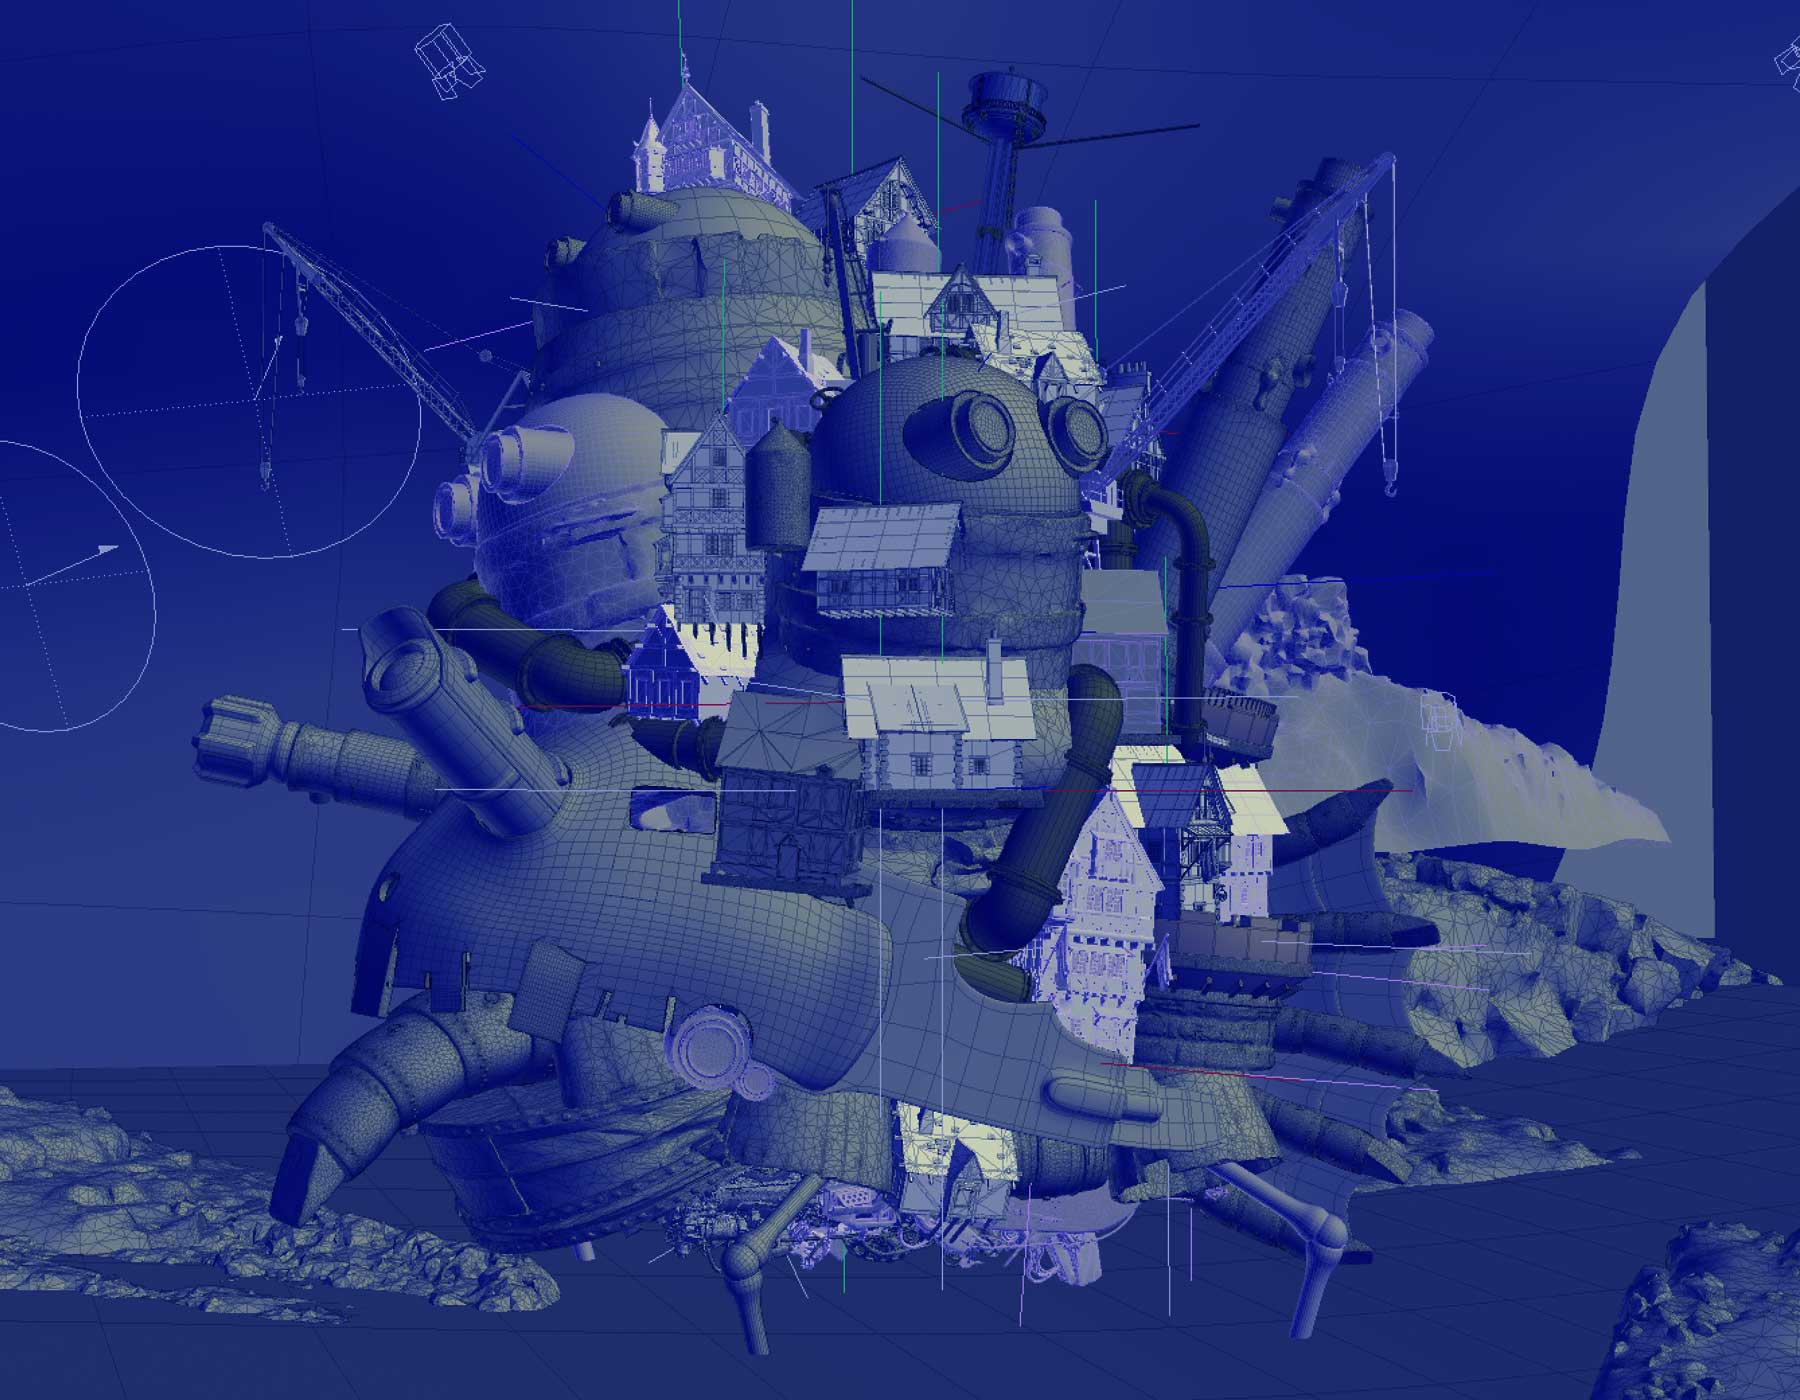 studio ghibli, howls moving castle, Ngon, Manchester Agency, 3d artist